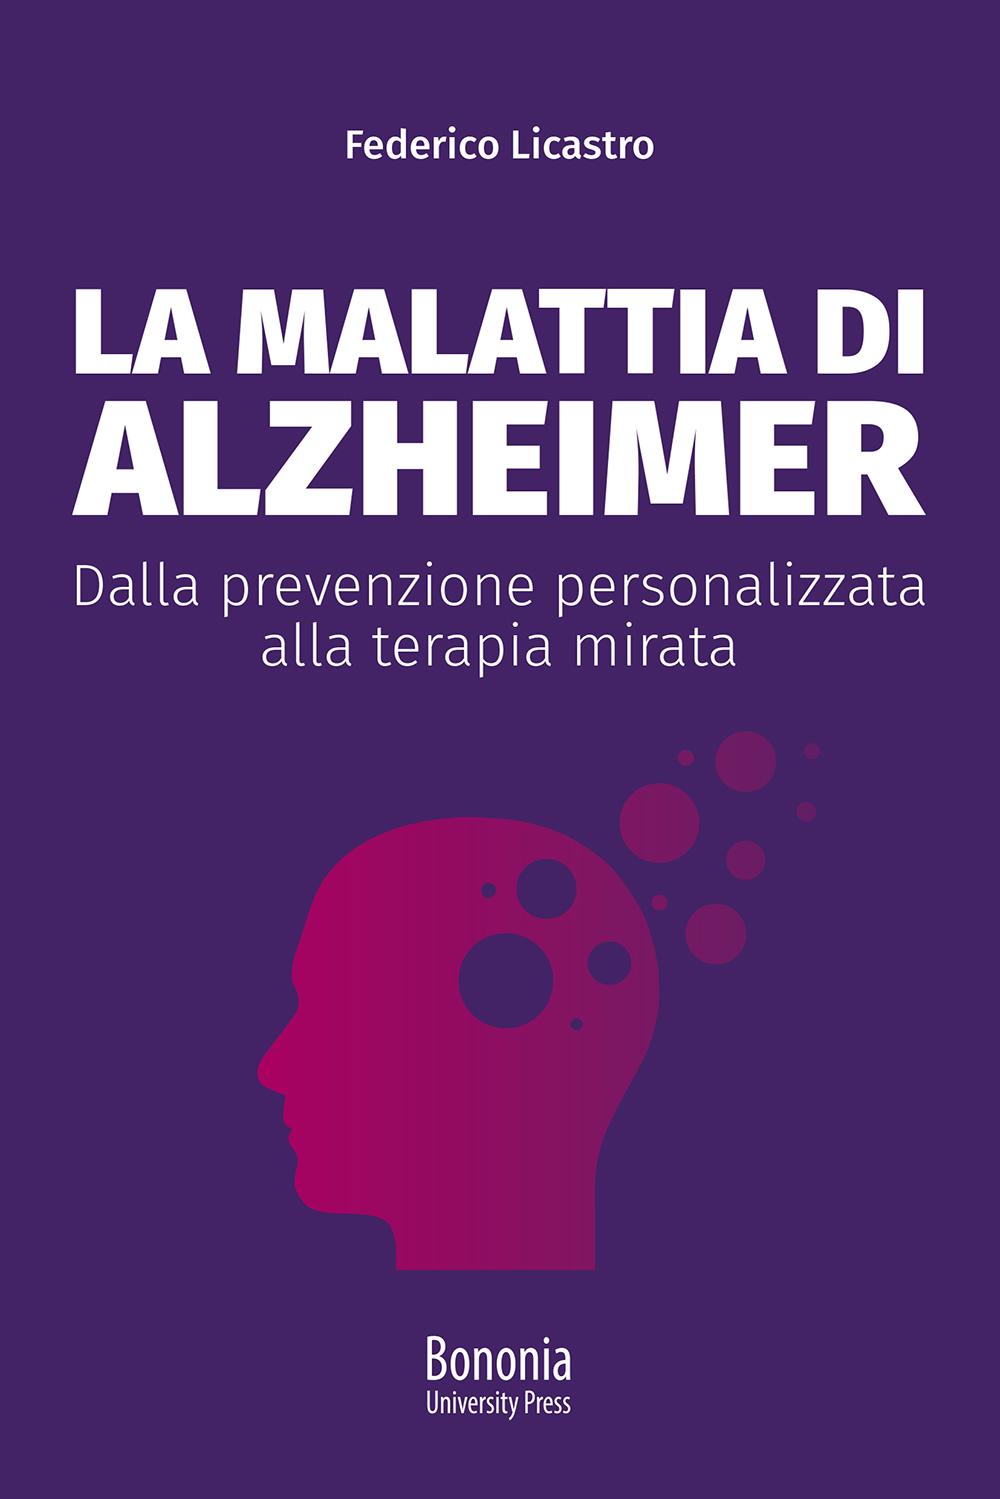 La malattia di Alzheimer - Bononia University Press